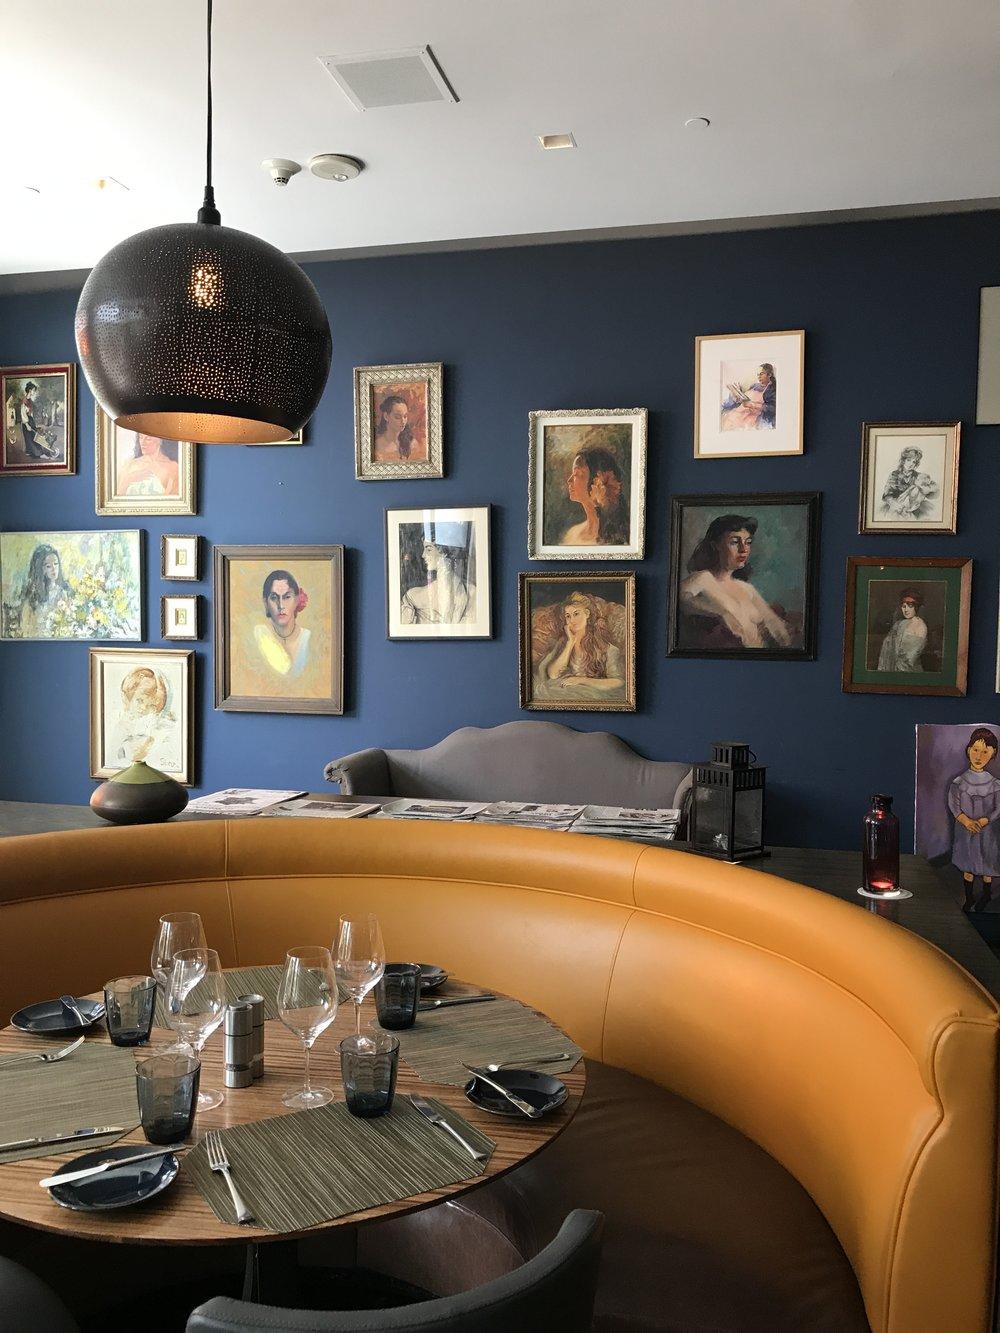 Home Sweet Hotel: Sofitel Los Angeles | truelane